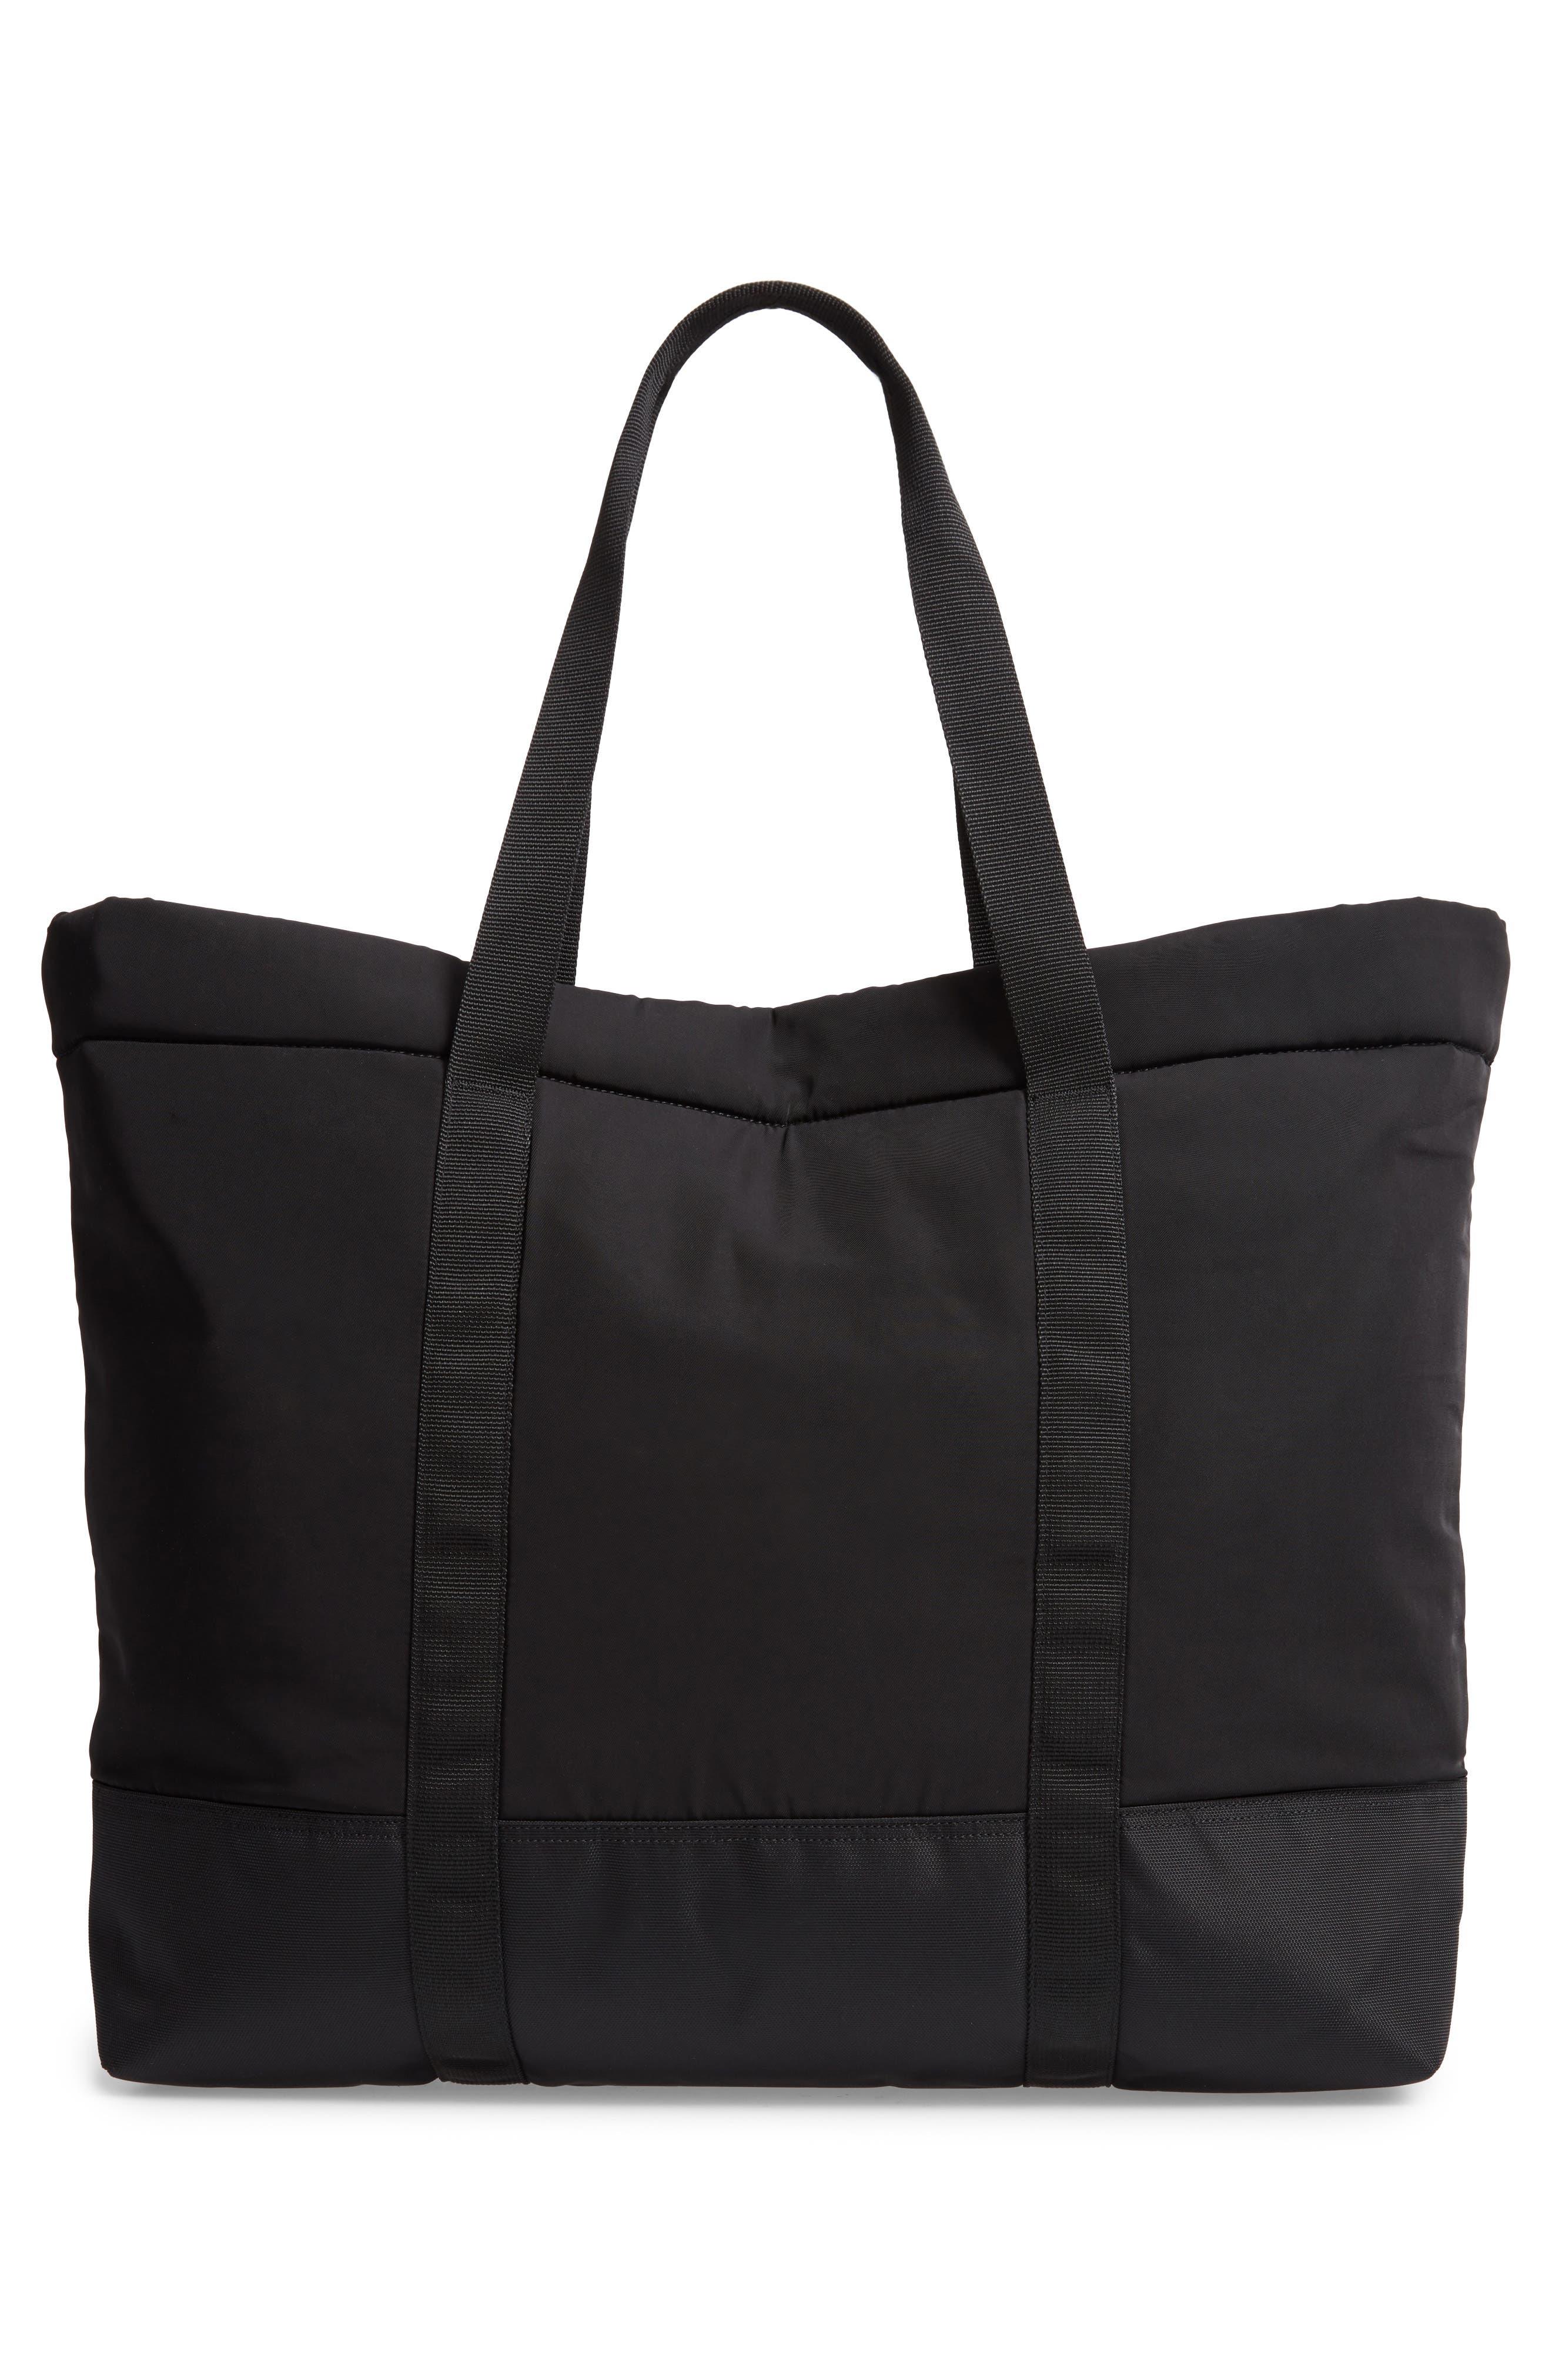 Military Shopper Tote Bag,                             Alternate thumbnail 3, color,                             001